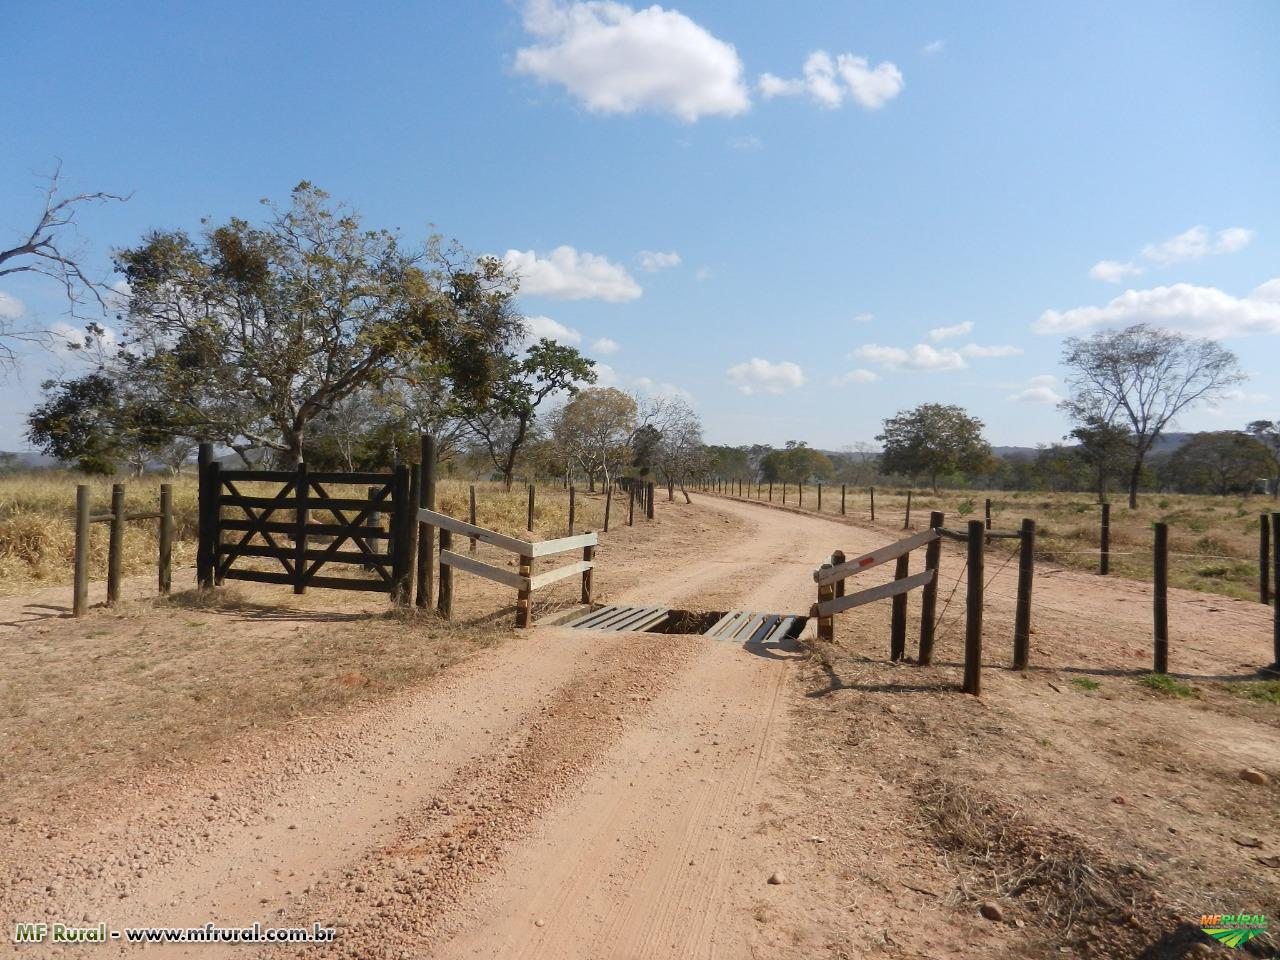 FAZENDA – 332 hectares - VÁRZEA DA PALMA (MG)